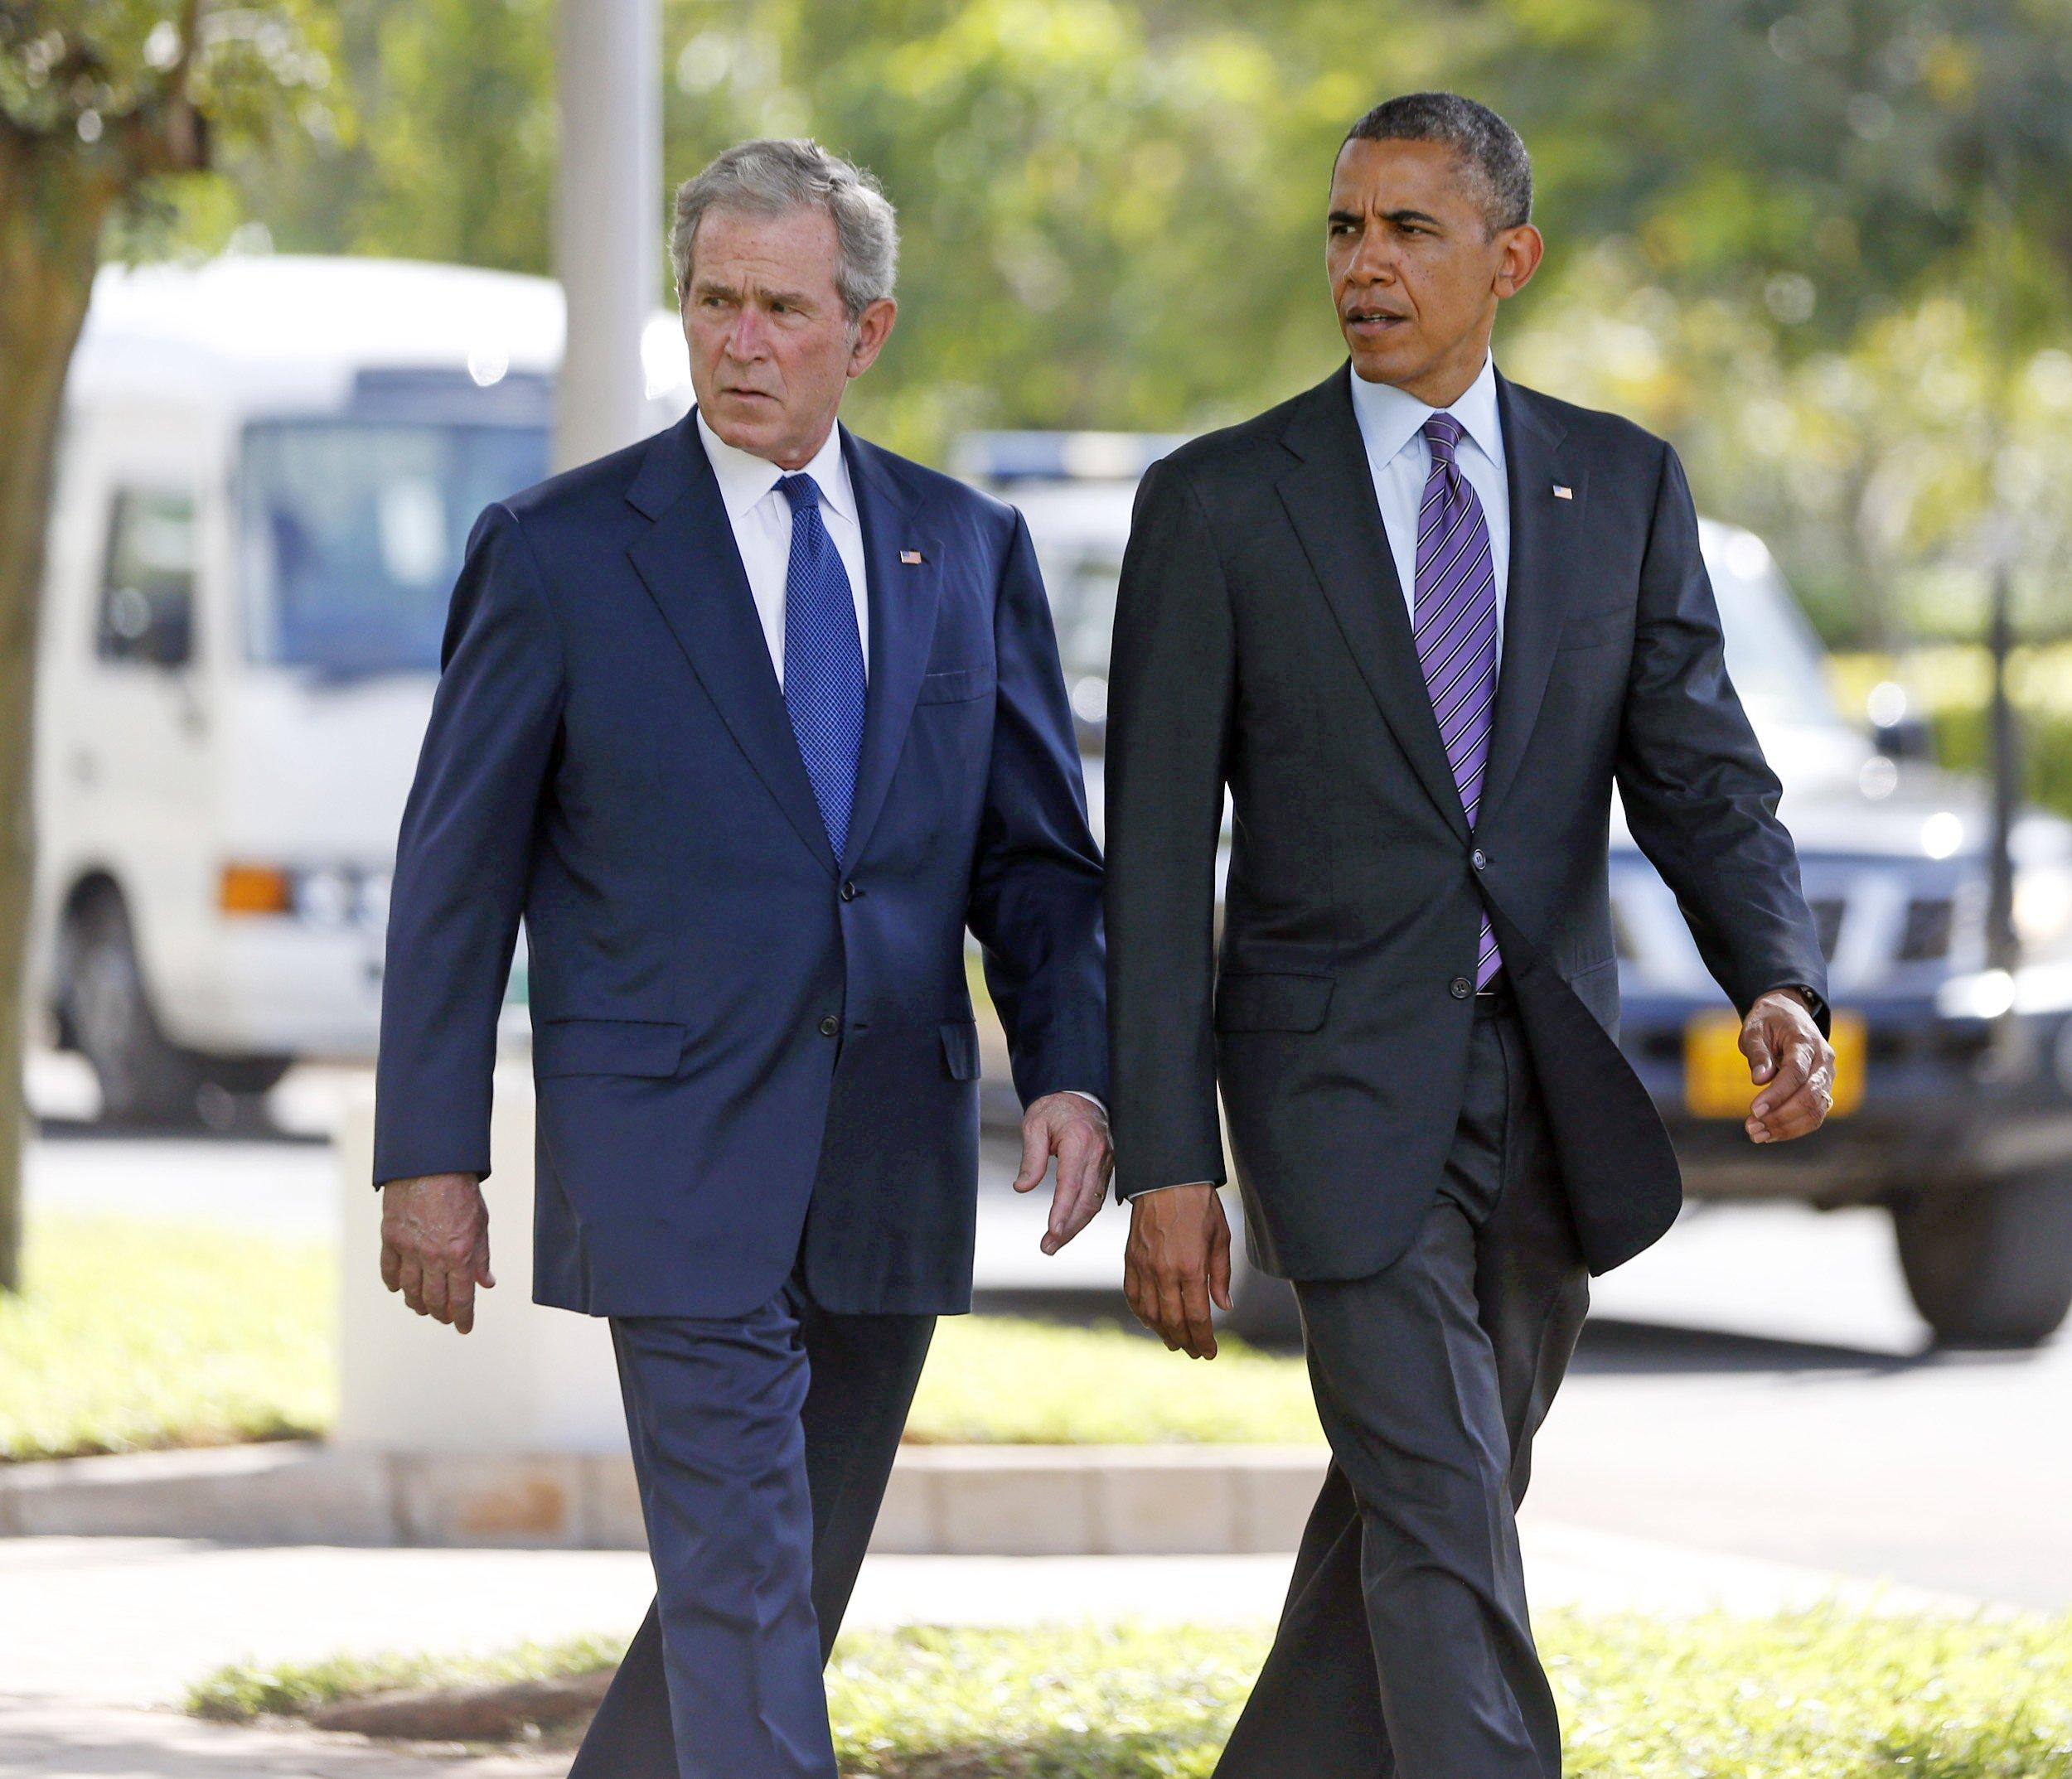 Obama Mid East strategy: a nod to Bush era, or new shift?